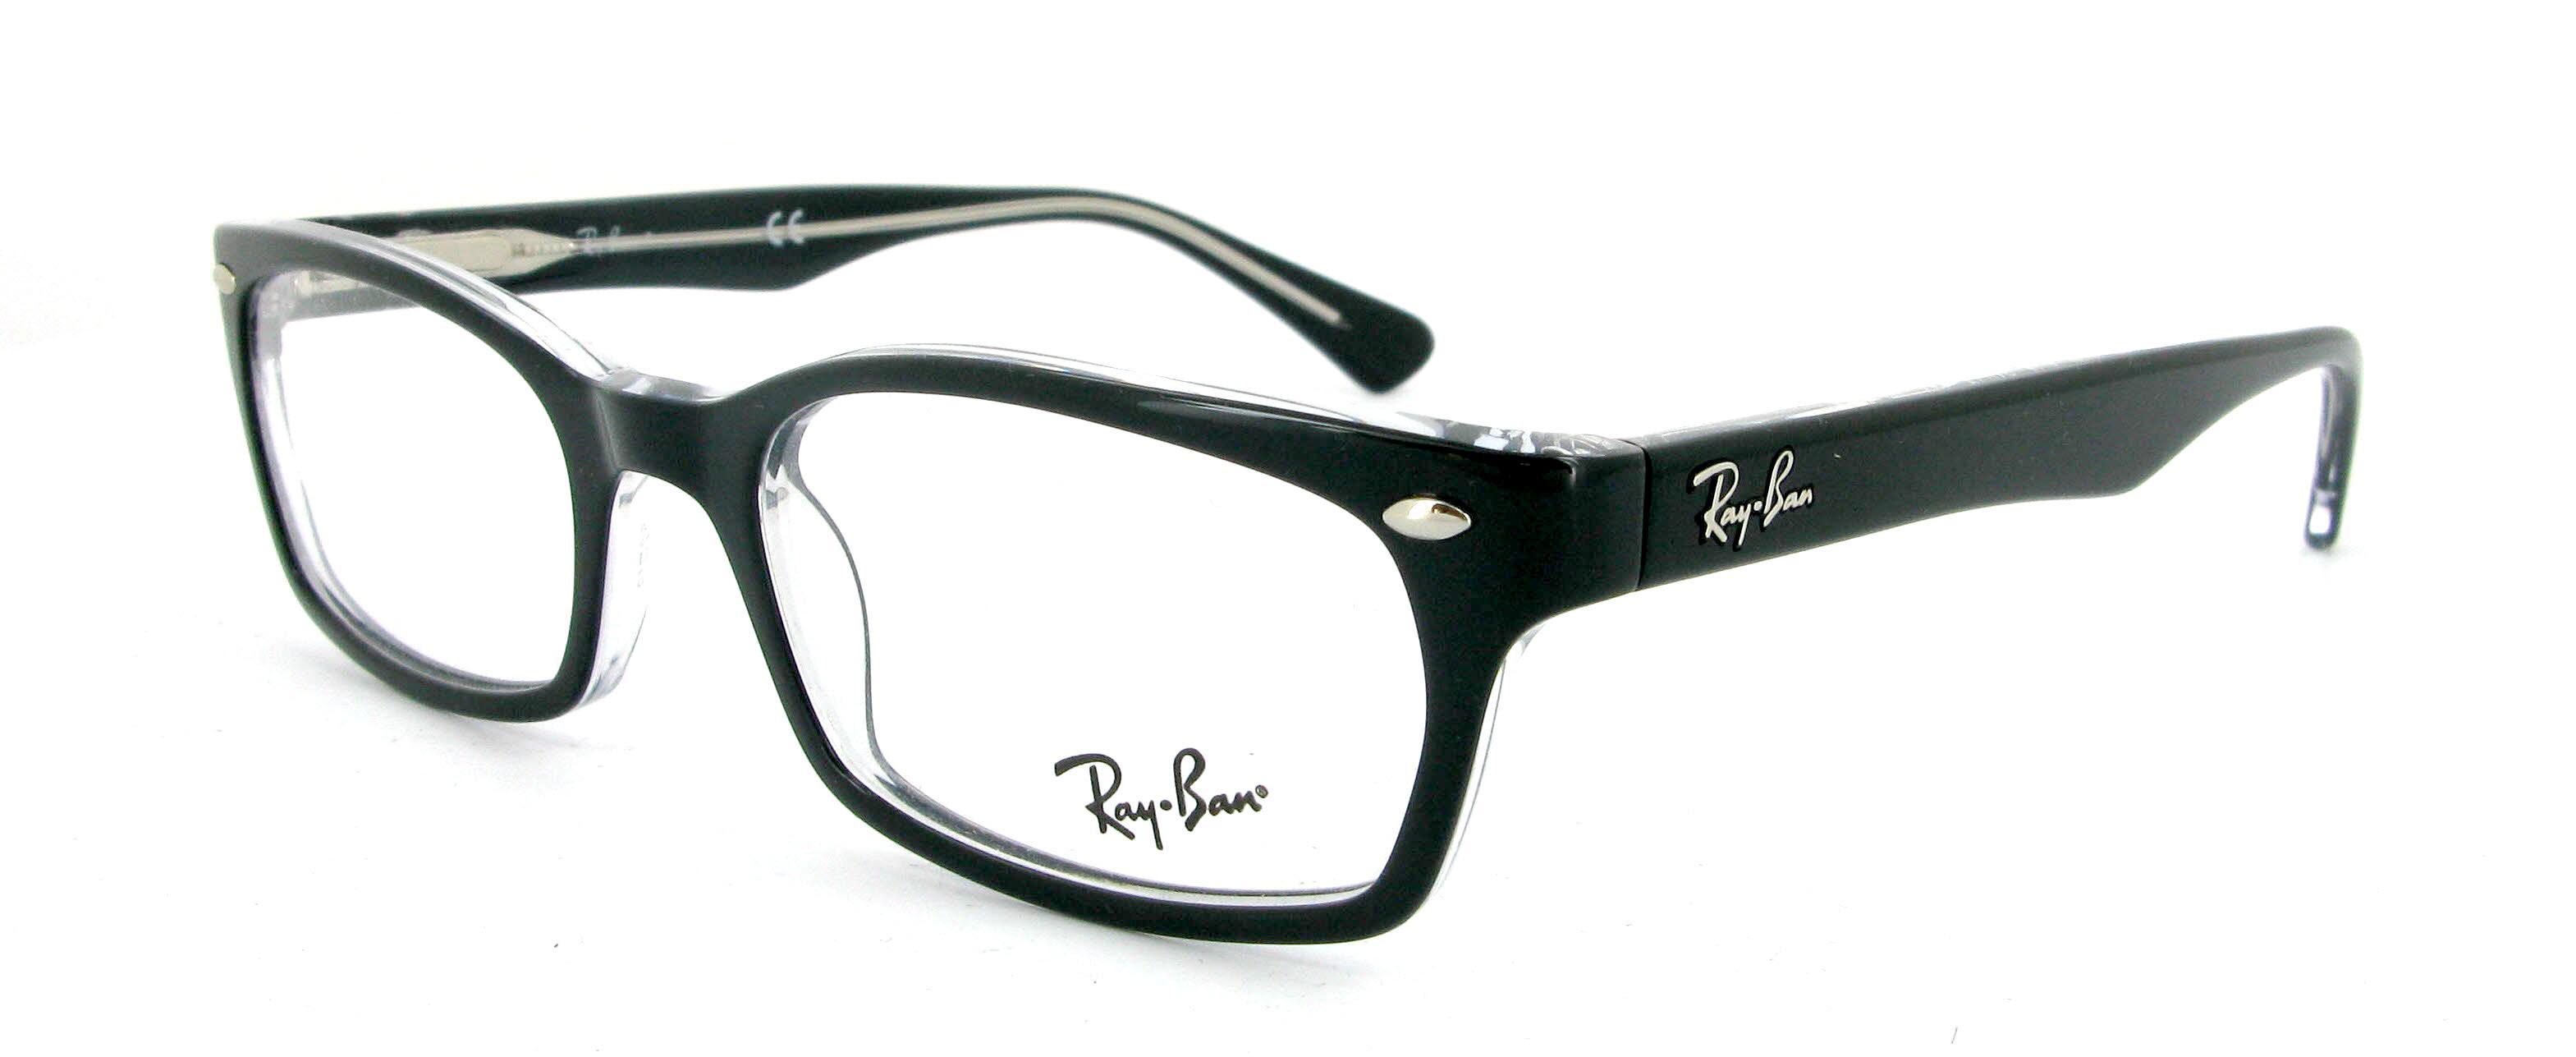 Glasses Frames Rx Optical : Eyeglasses RX 5150 2034 48/19 RAY-BAN